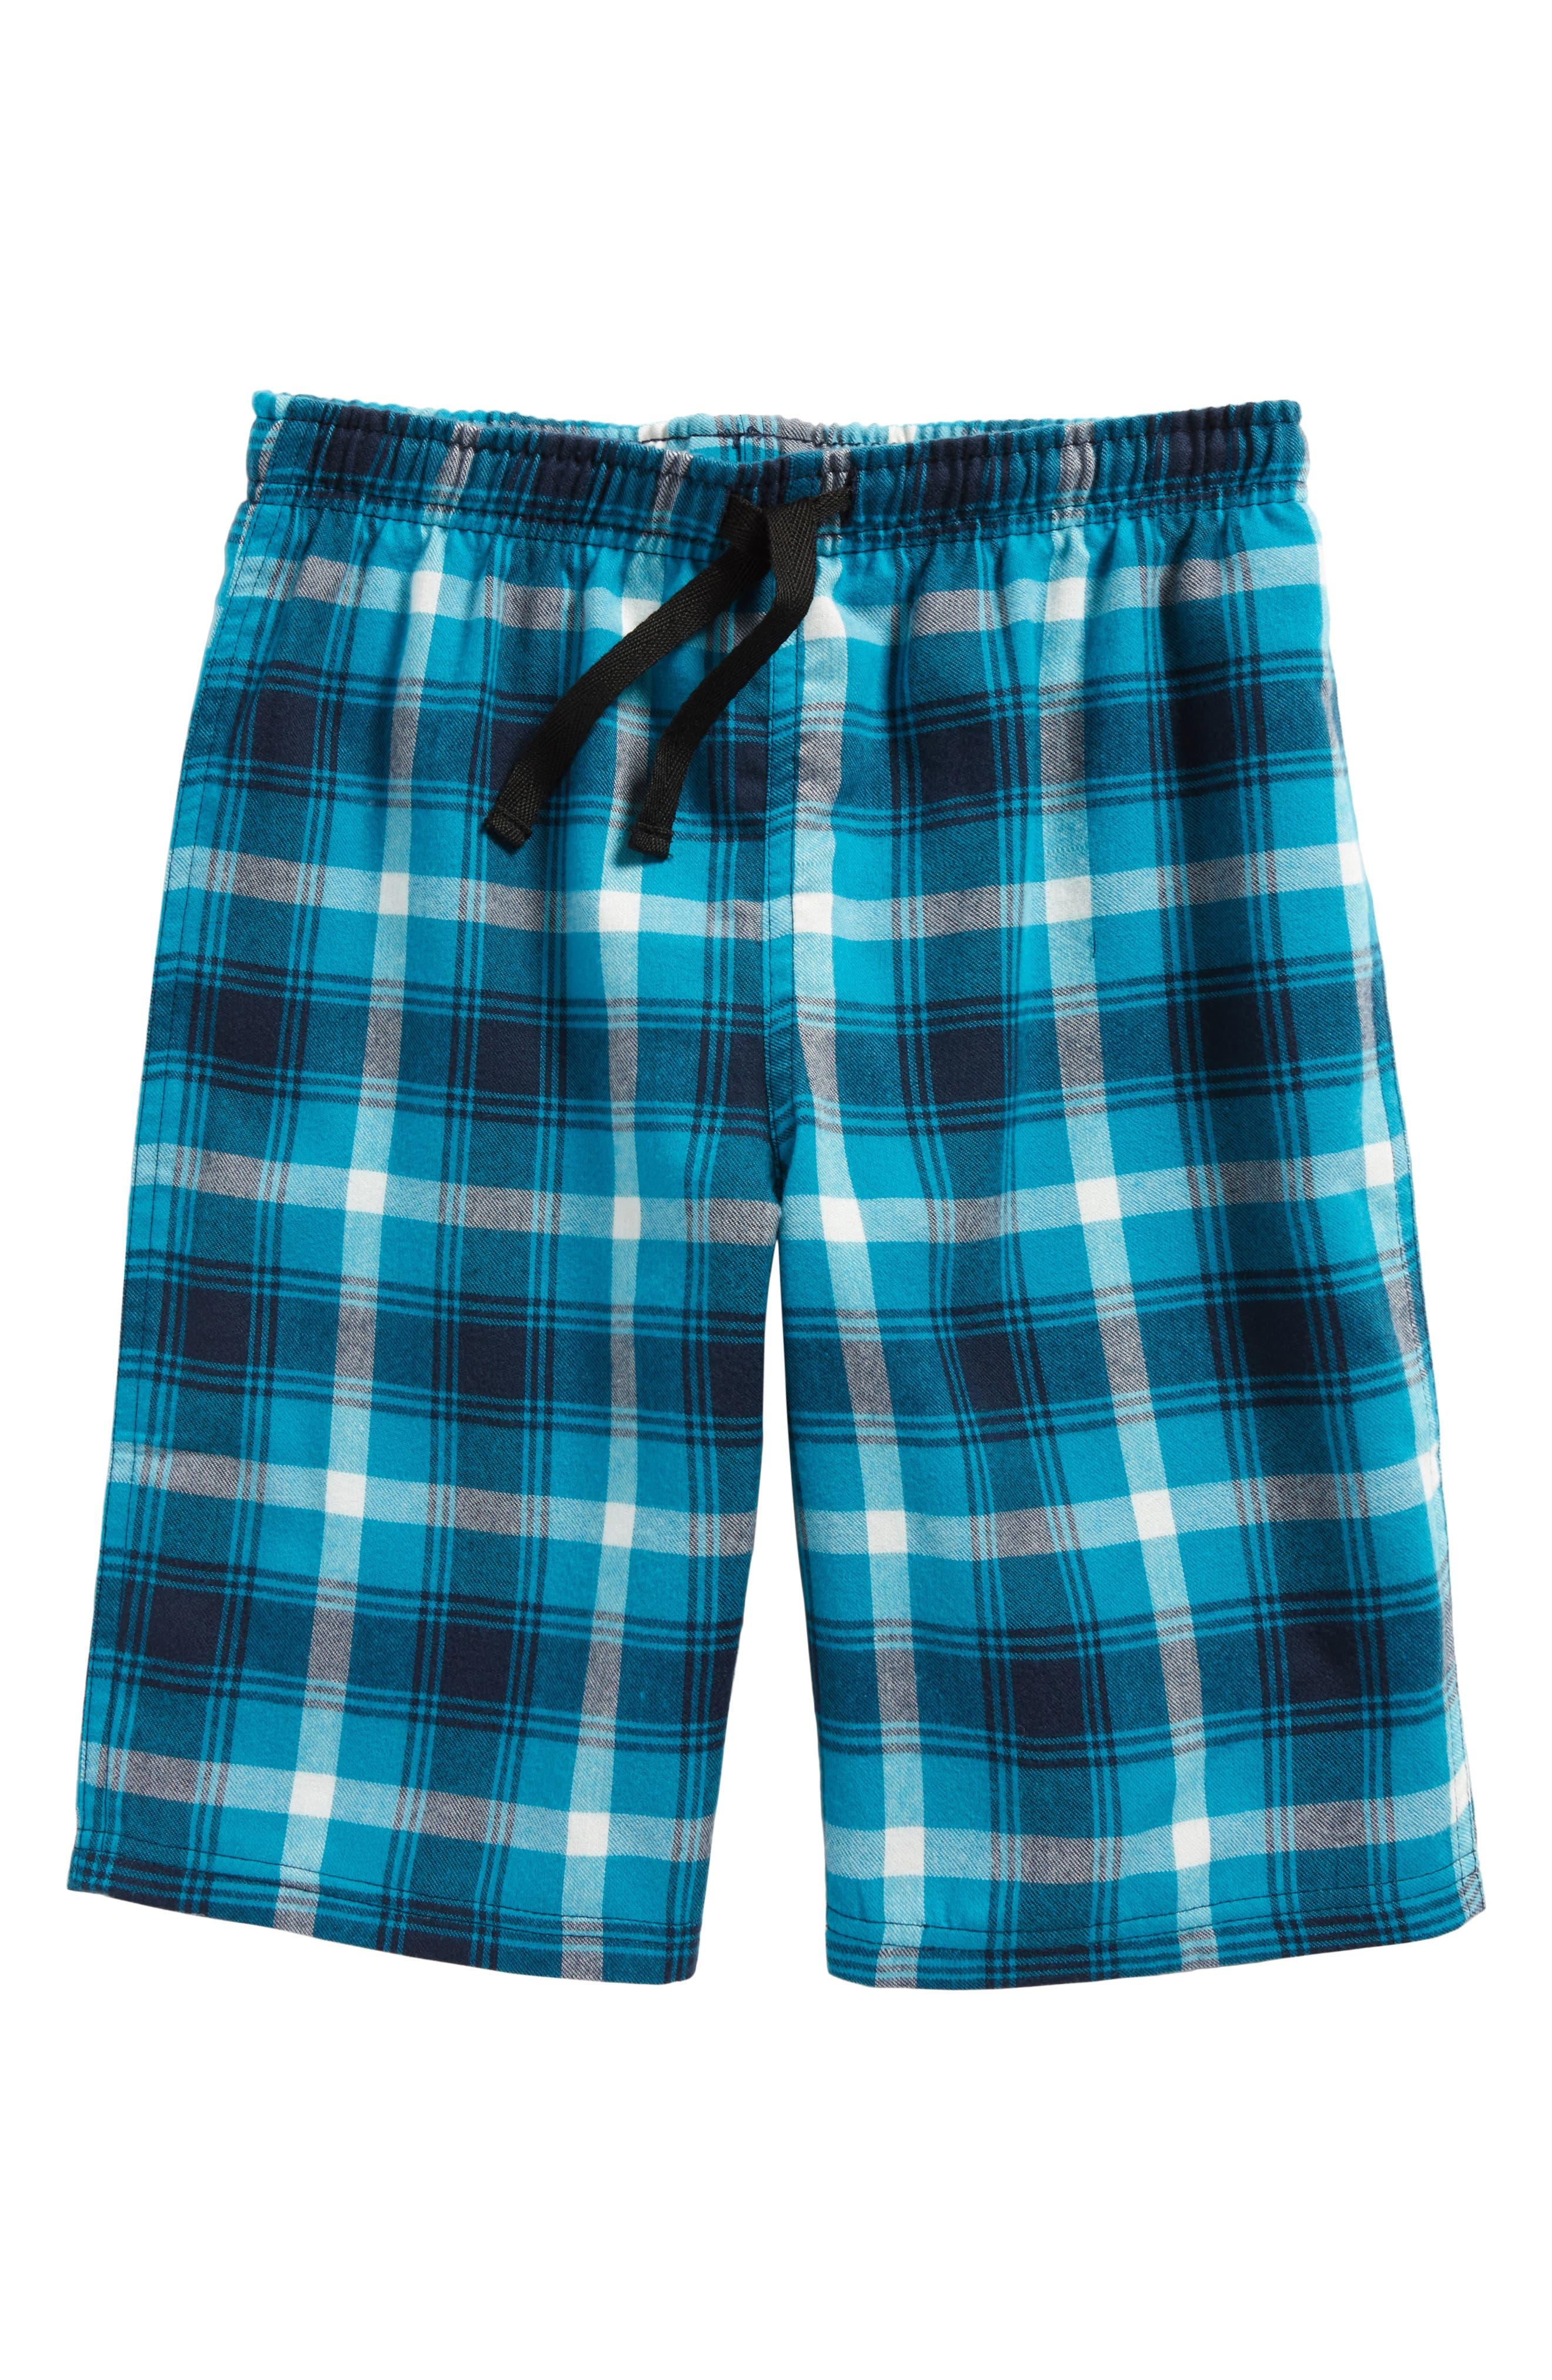 Main Image - Tucker + Tate Flannel Shorts (Big Boys)